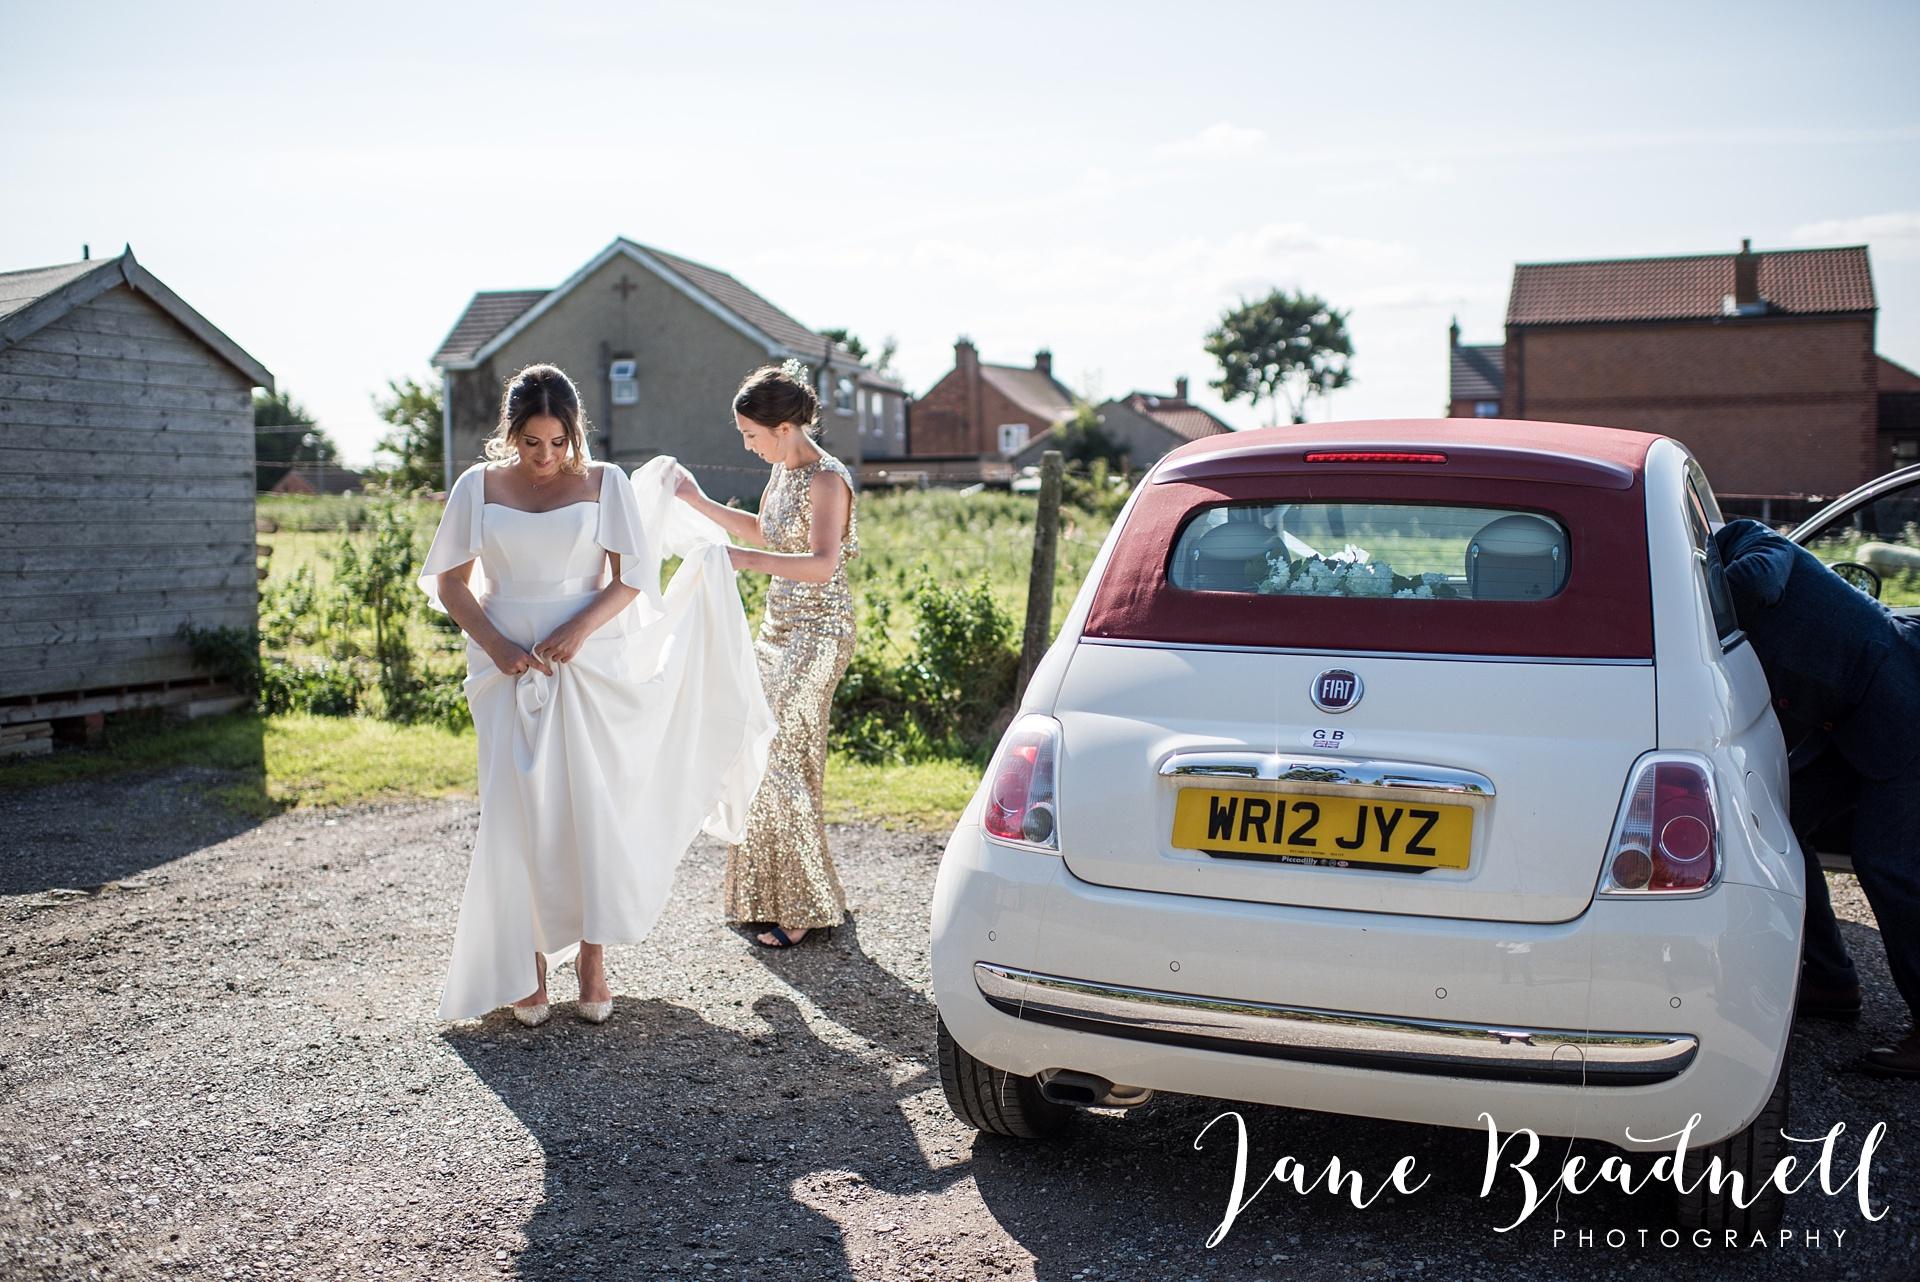 fine-art-wedding-photographer-jane-beadnell-yorkshire-wedding-photographer_0042